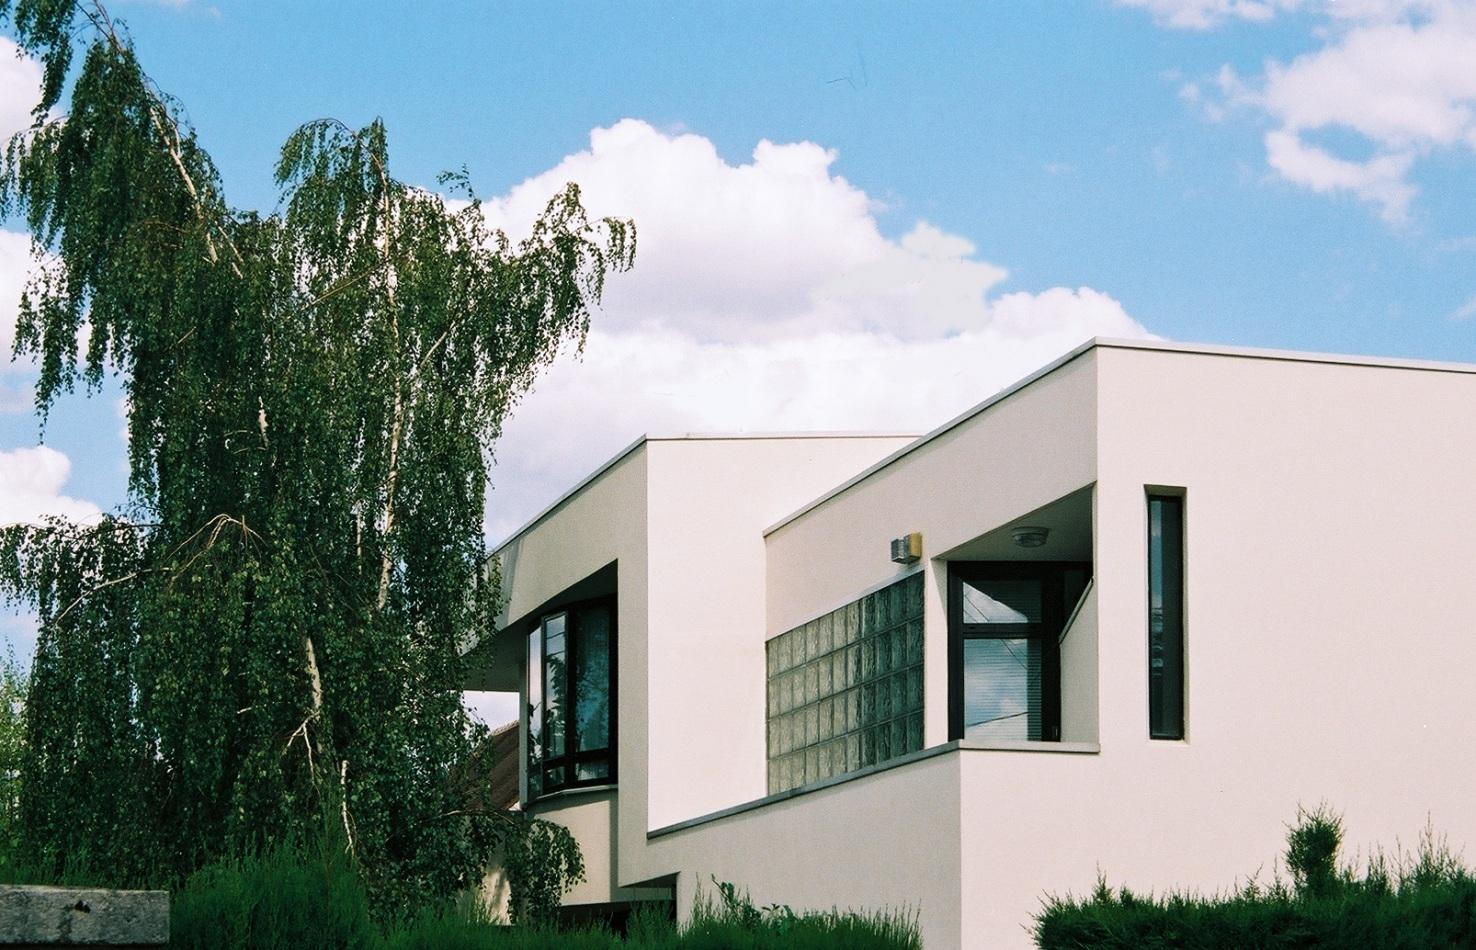 villa pallisco vitry val de marne denis humbert. Black Bedroom Furniture Sets. Home Design Ideas